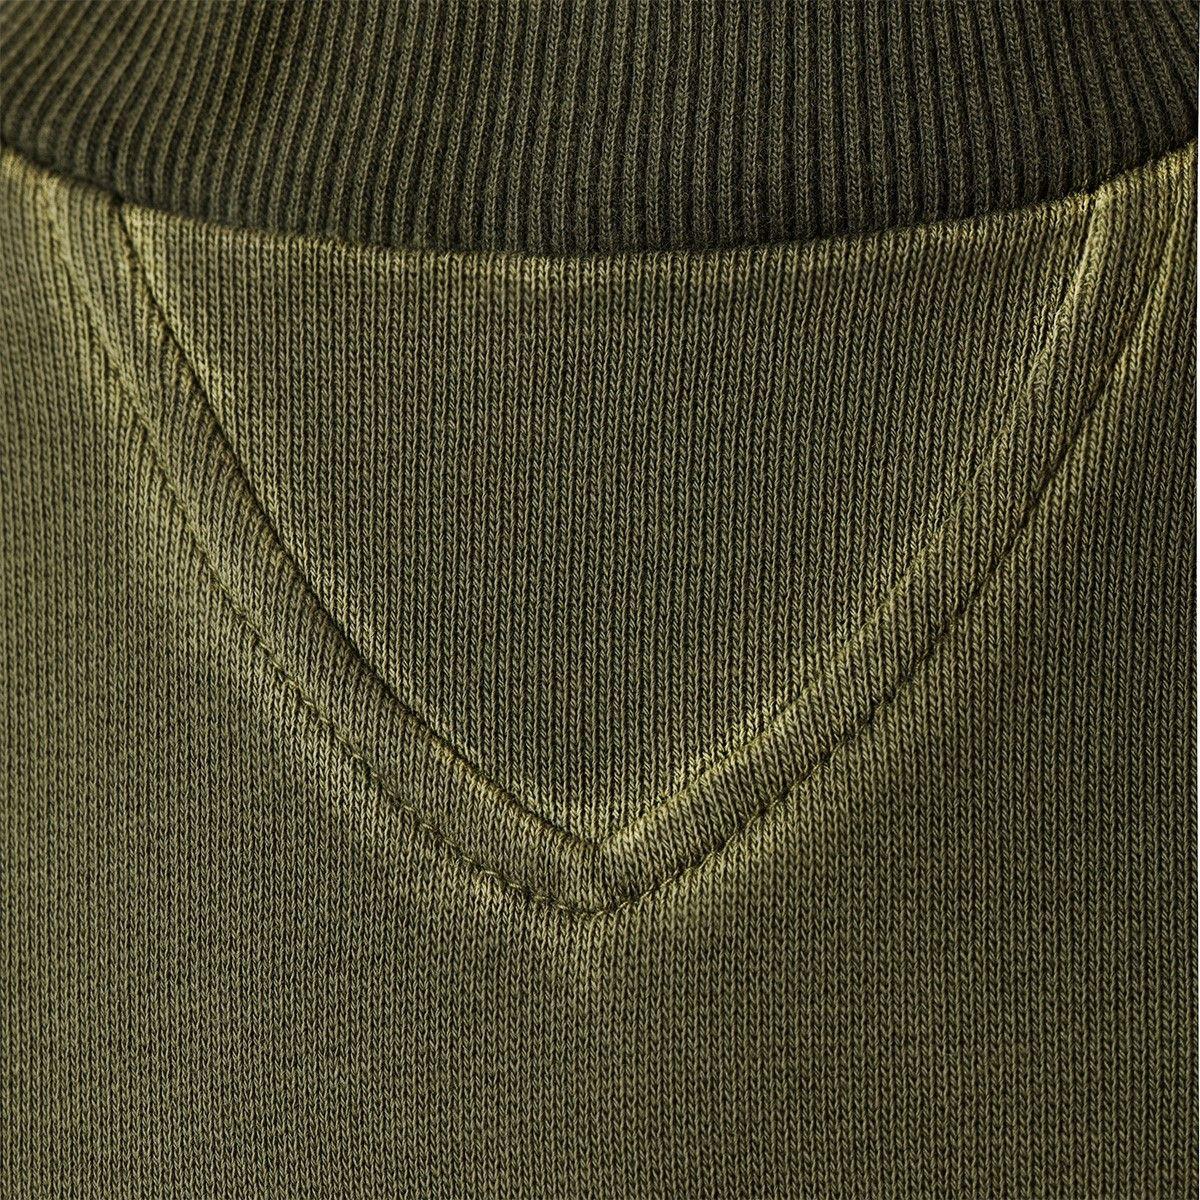 【DUCATI performance】Metropolitan AW13 運動衫 - 「Webike-摩托百貨」